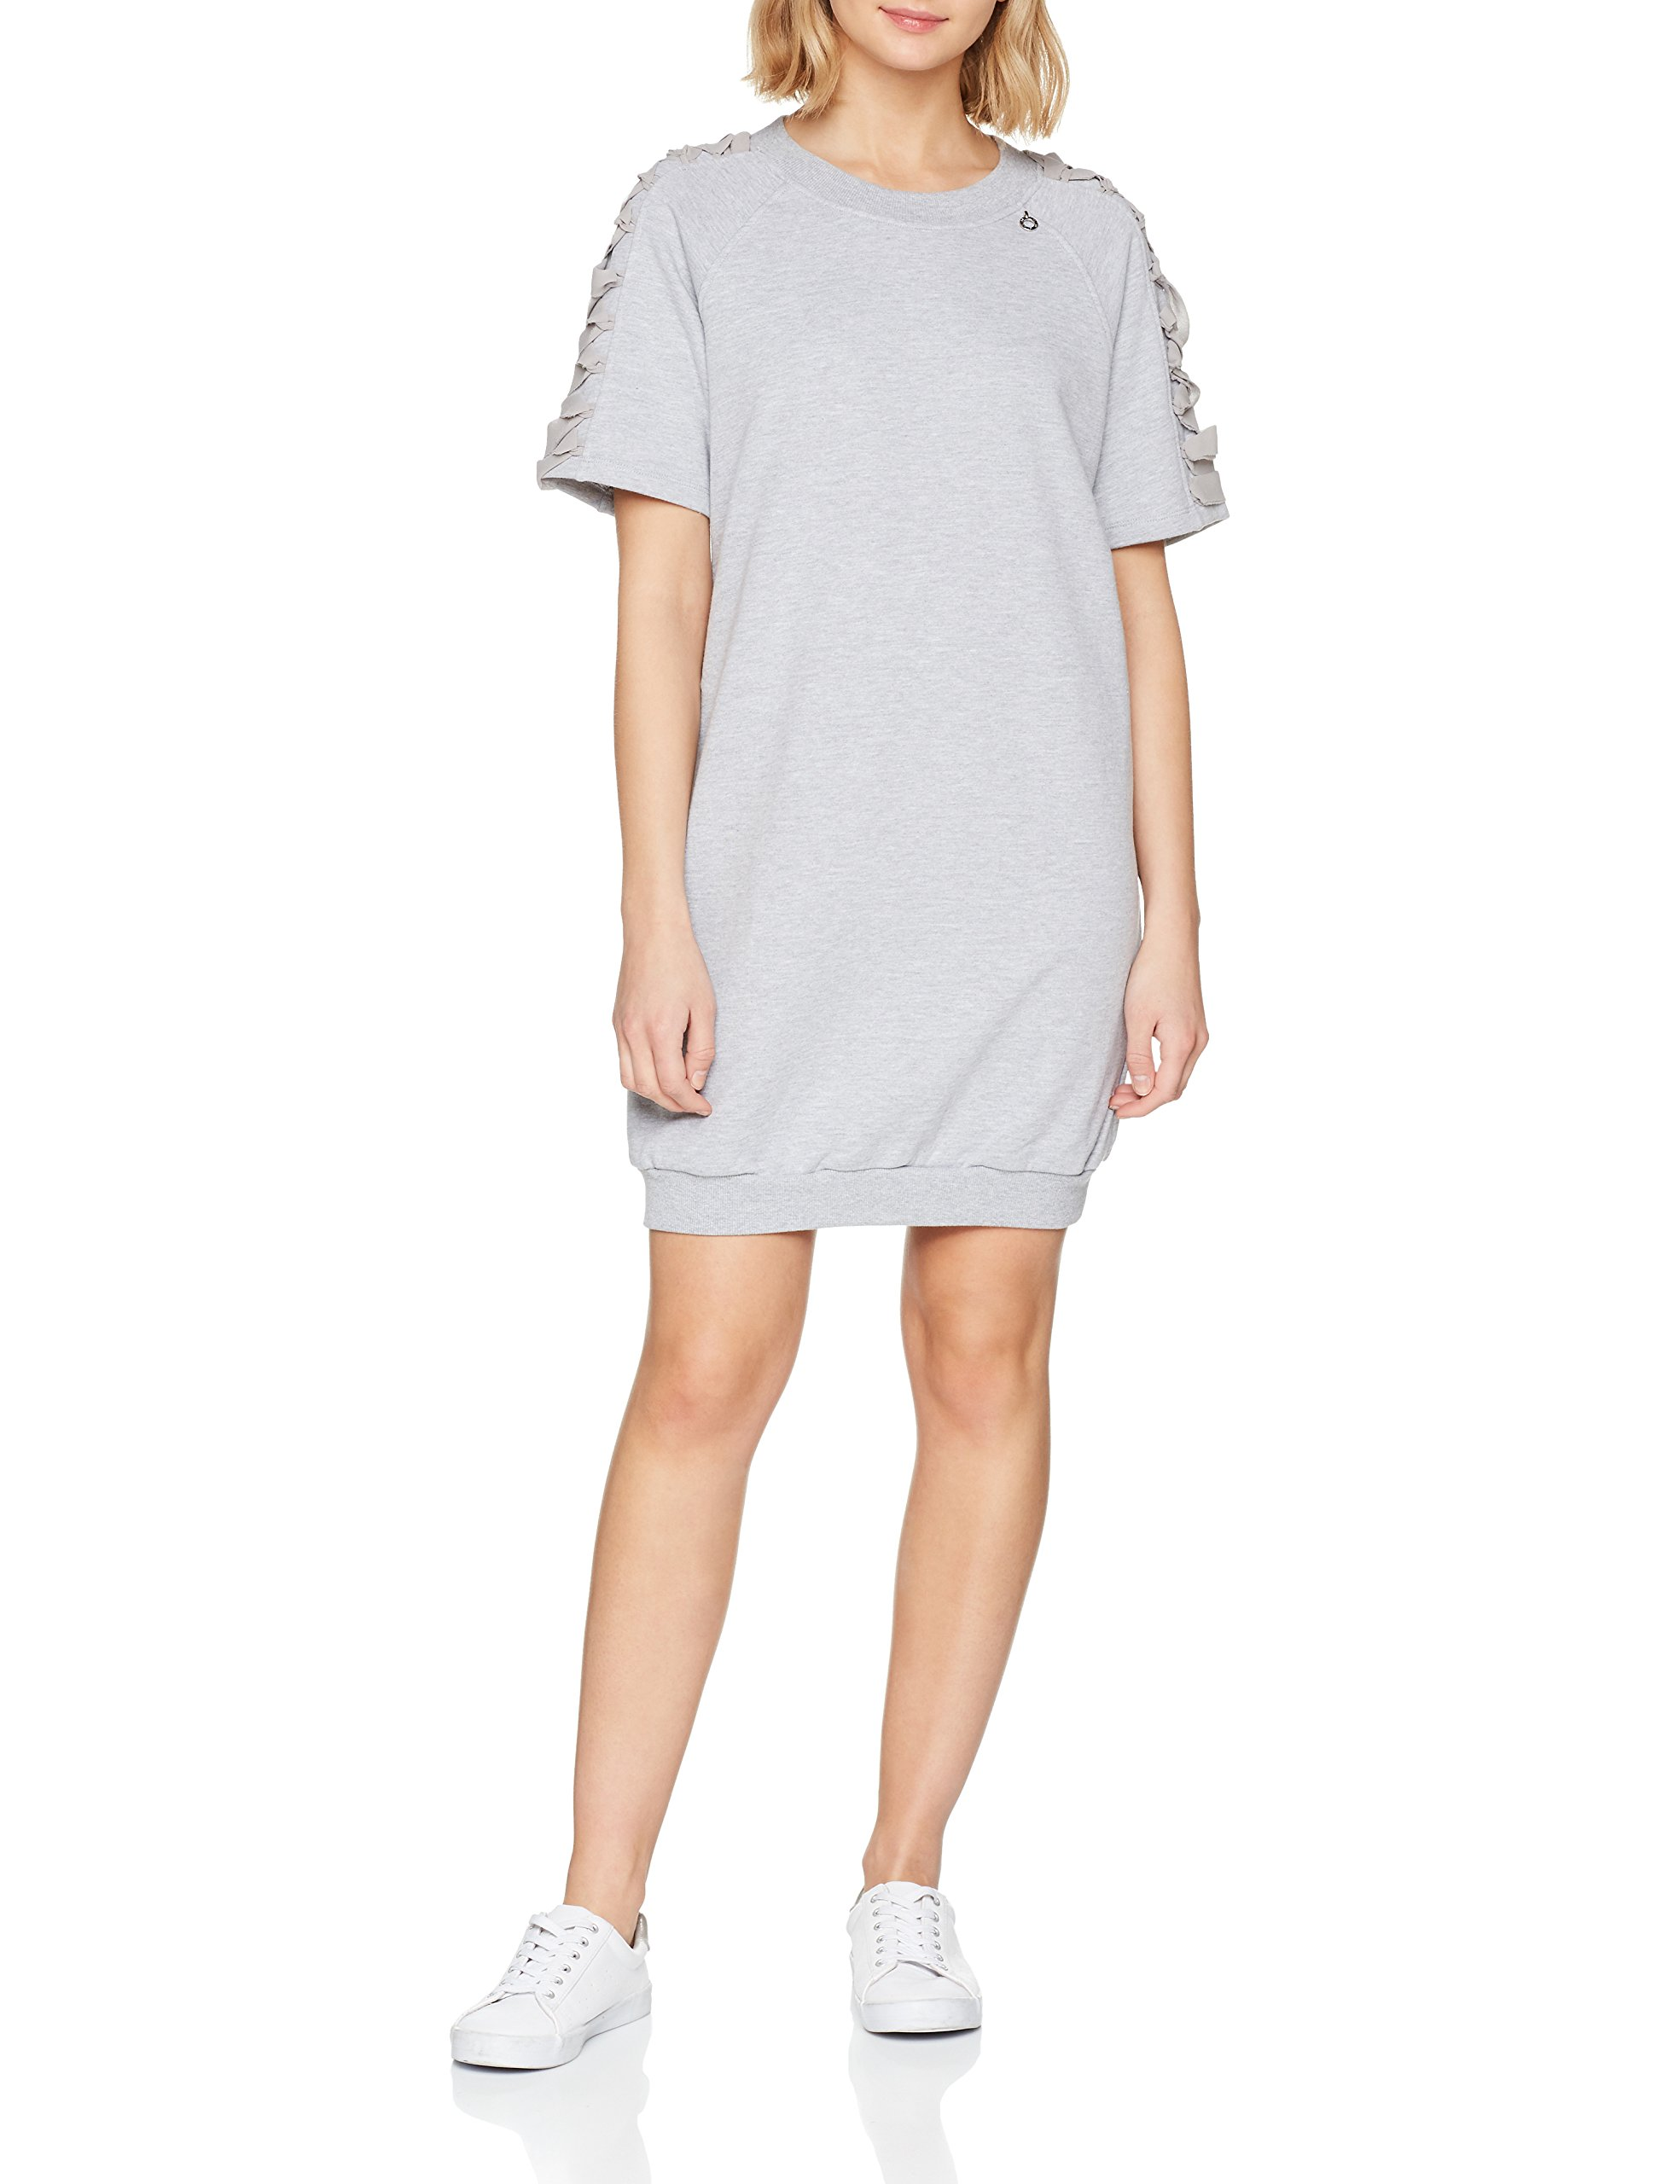 Assos Ash Femme RobeGrislight Grey Relish 1186Xs KJTcF13l